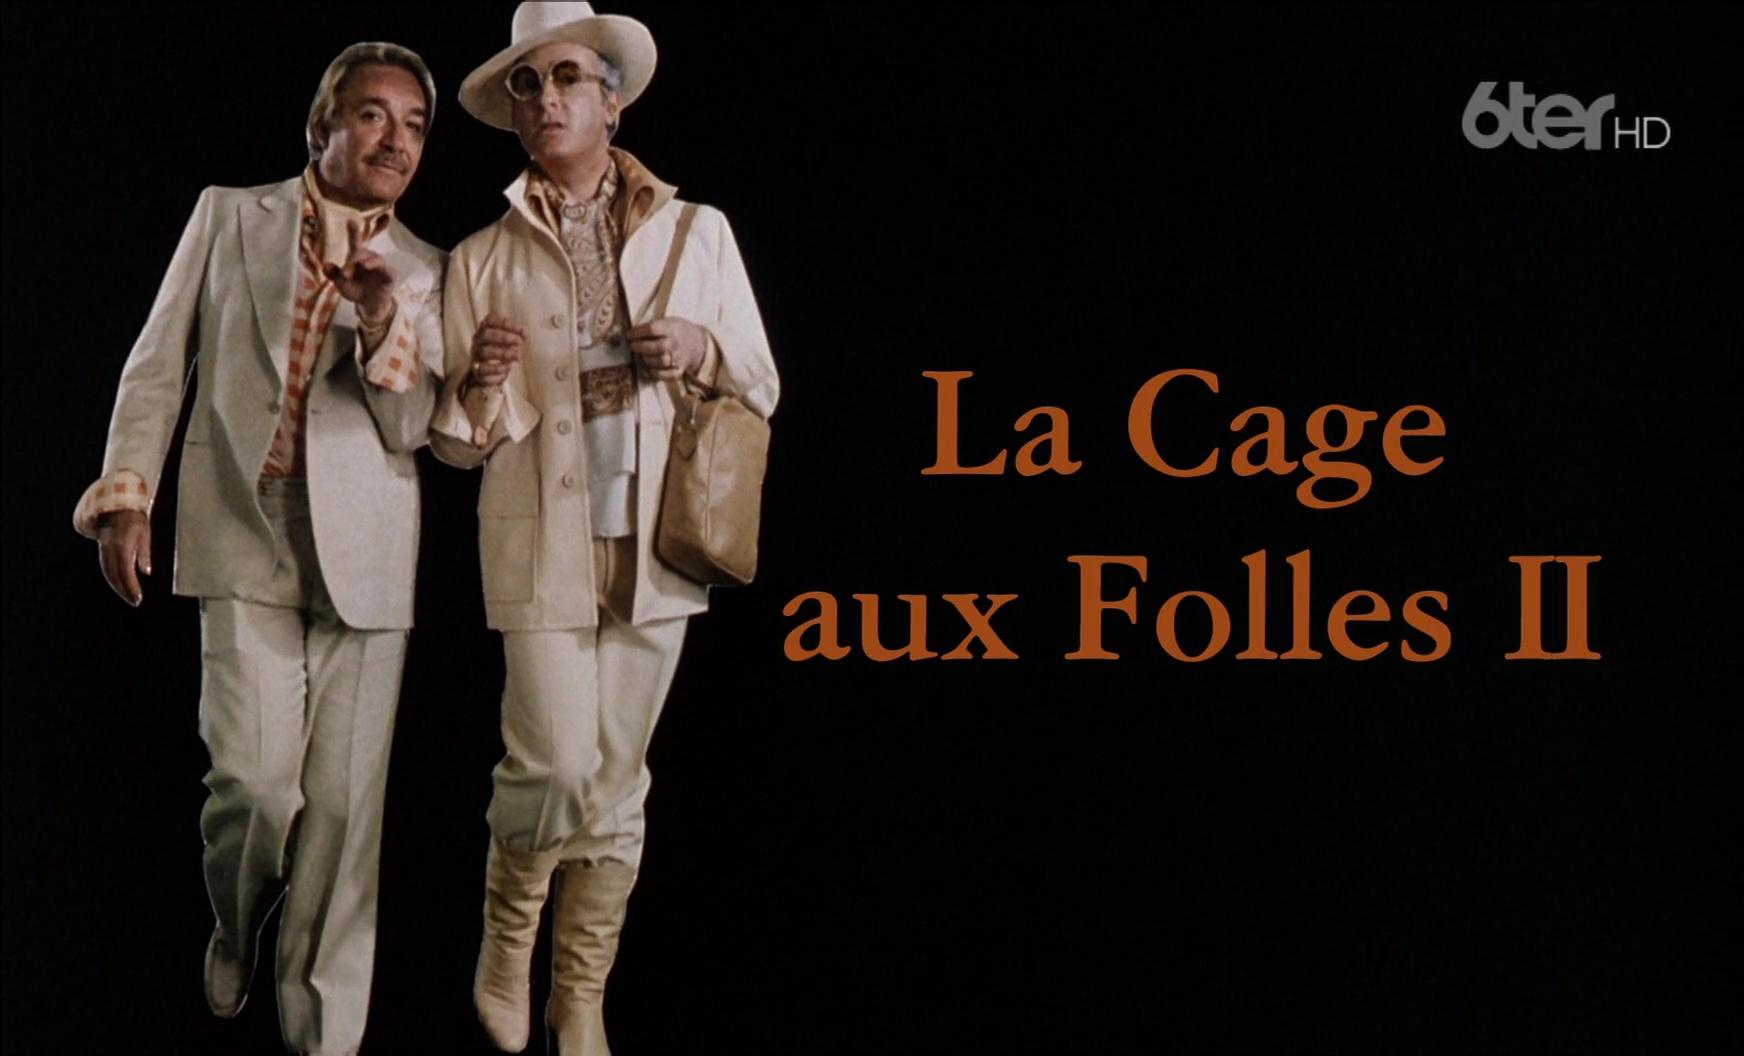 la.cage.aux.folles.iic8k6p.jpg